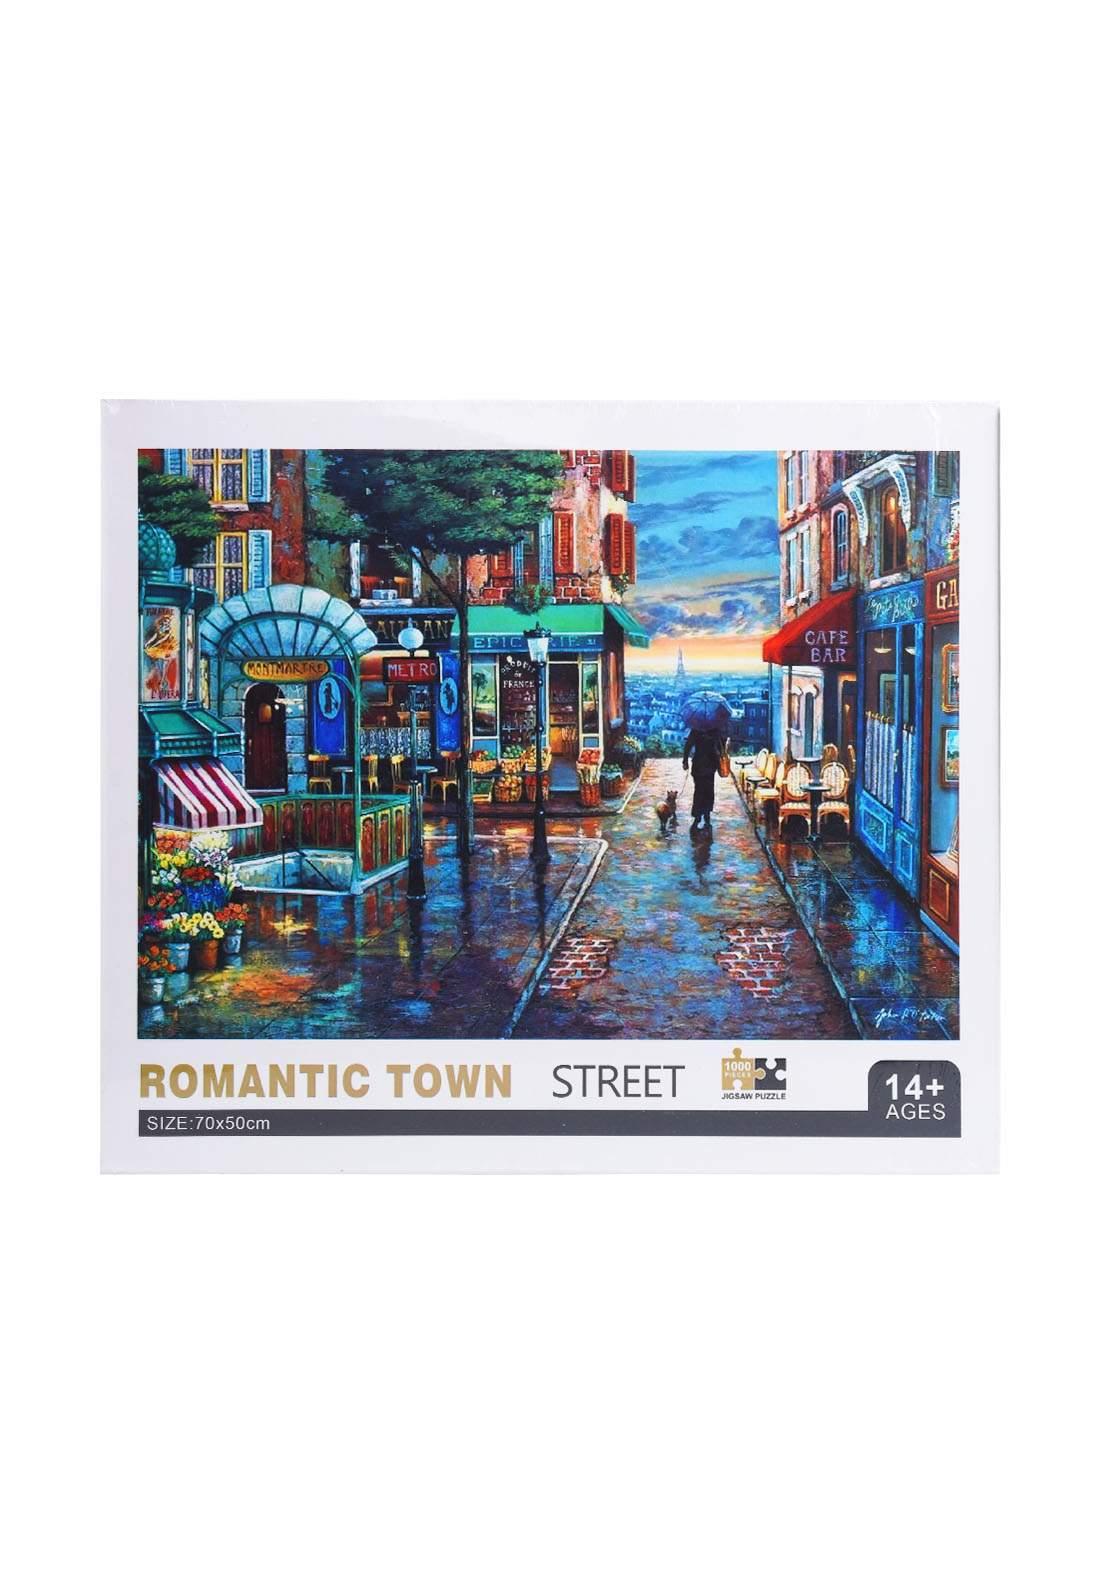 Jigsaw Puzzle Romantic Town Street 1000Pcs لعبة تركيب القطع بشكل شارع المدينة الرومانسي